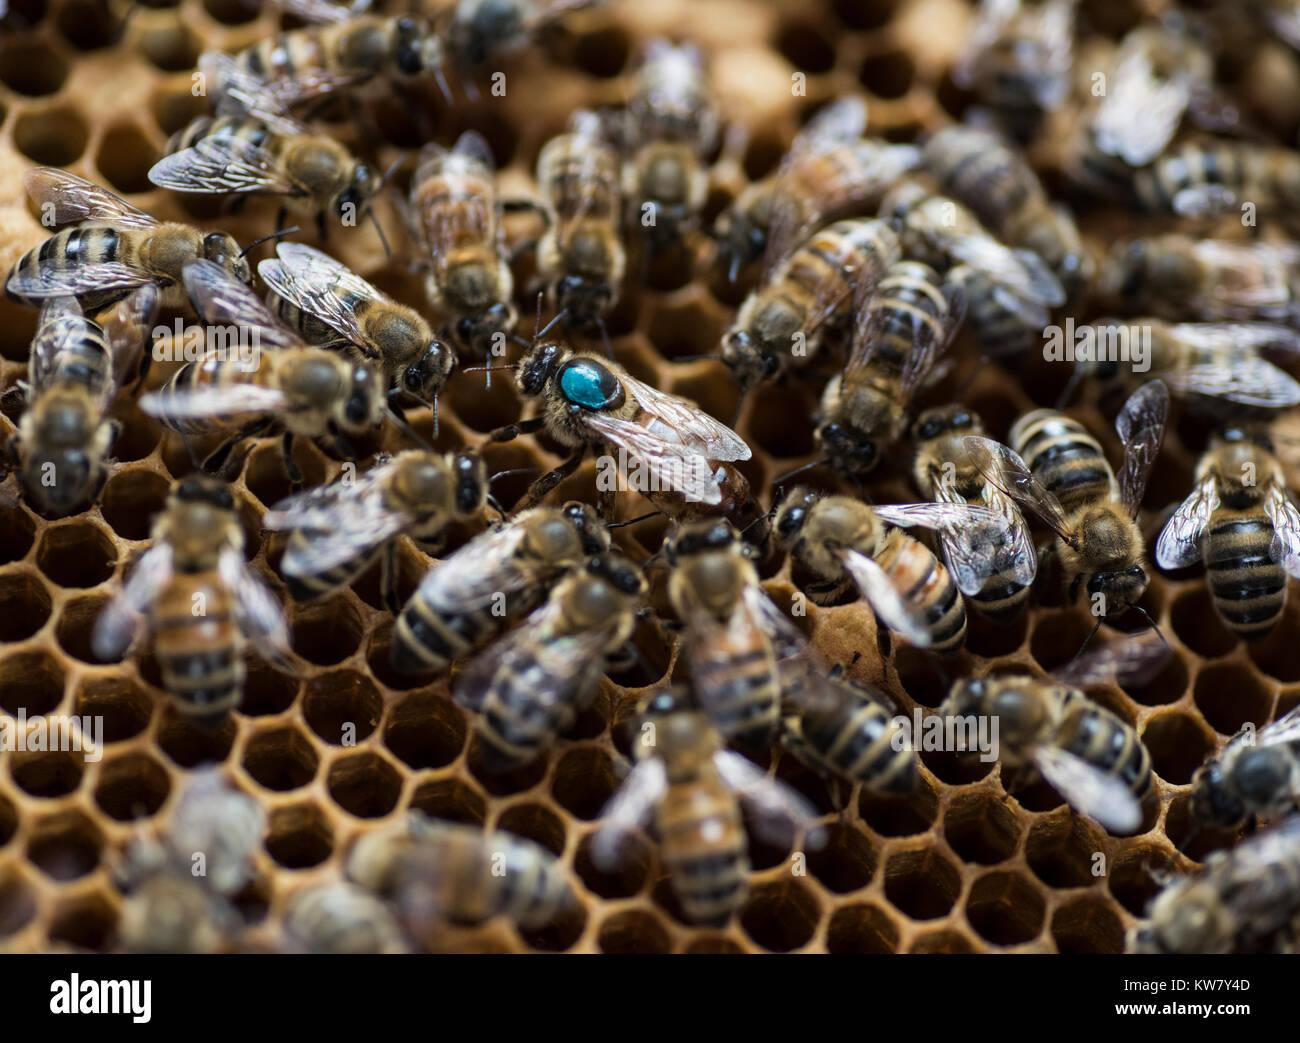 Honey bees closeup, macro, bee hive - Stock Image